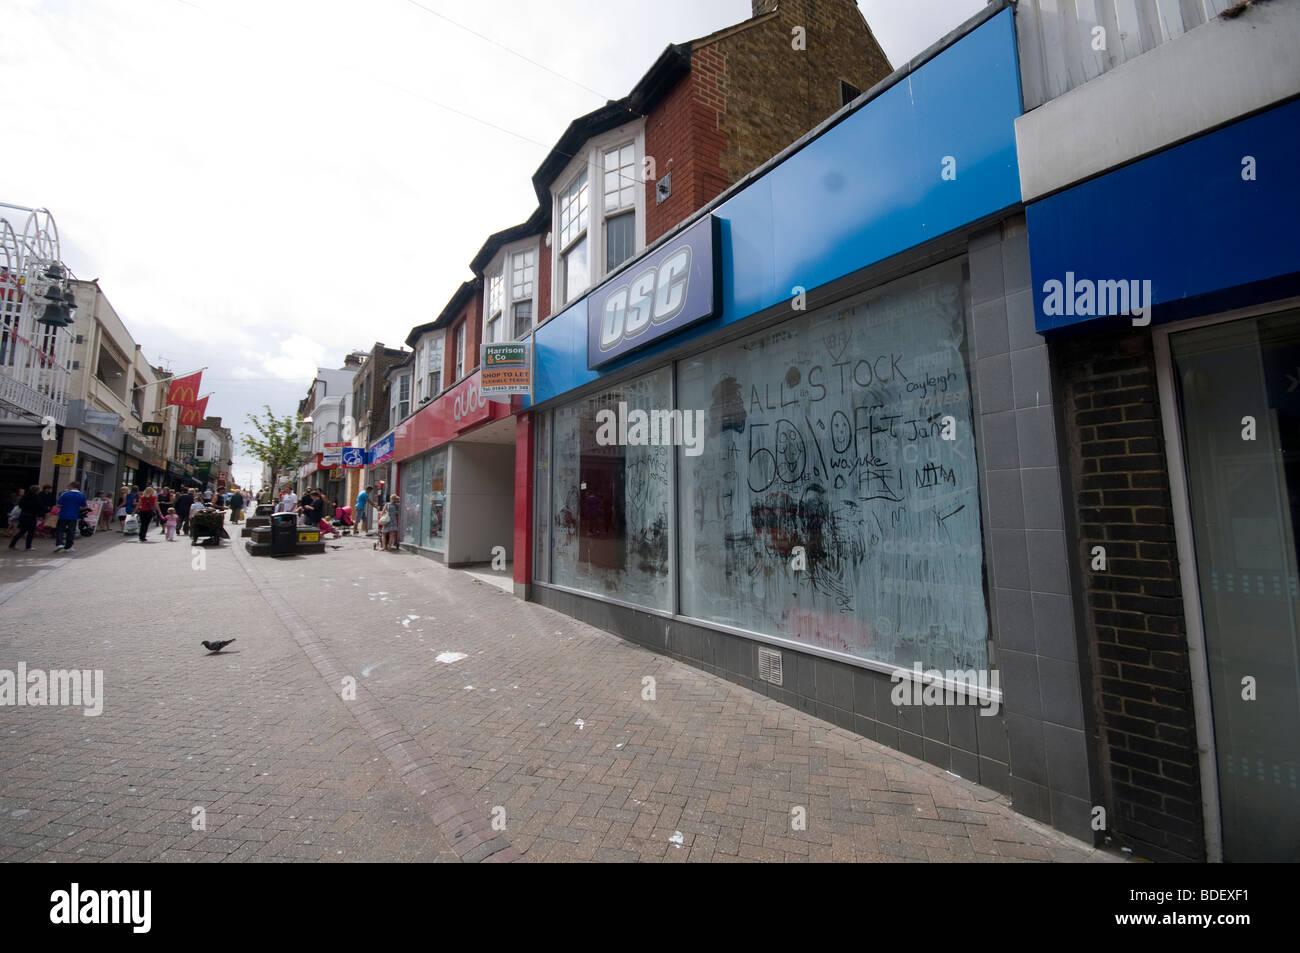 Margate High street empty shops - Stock Image